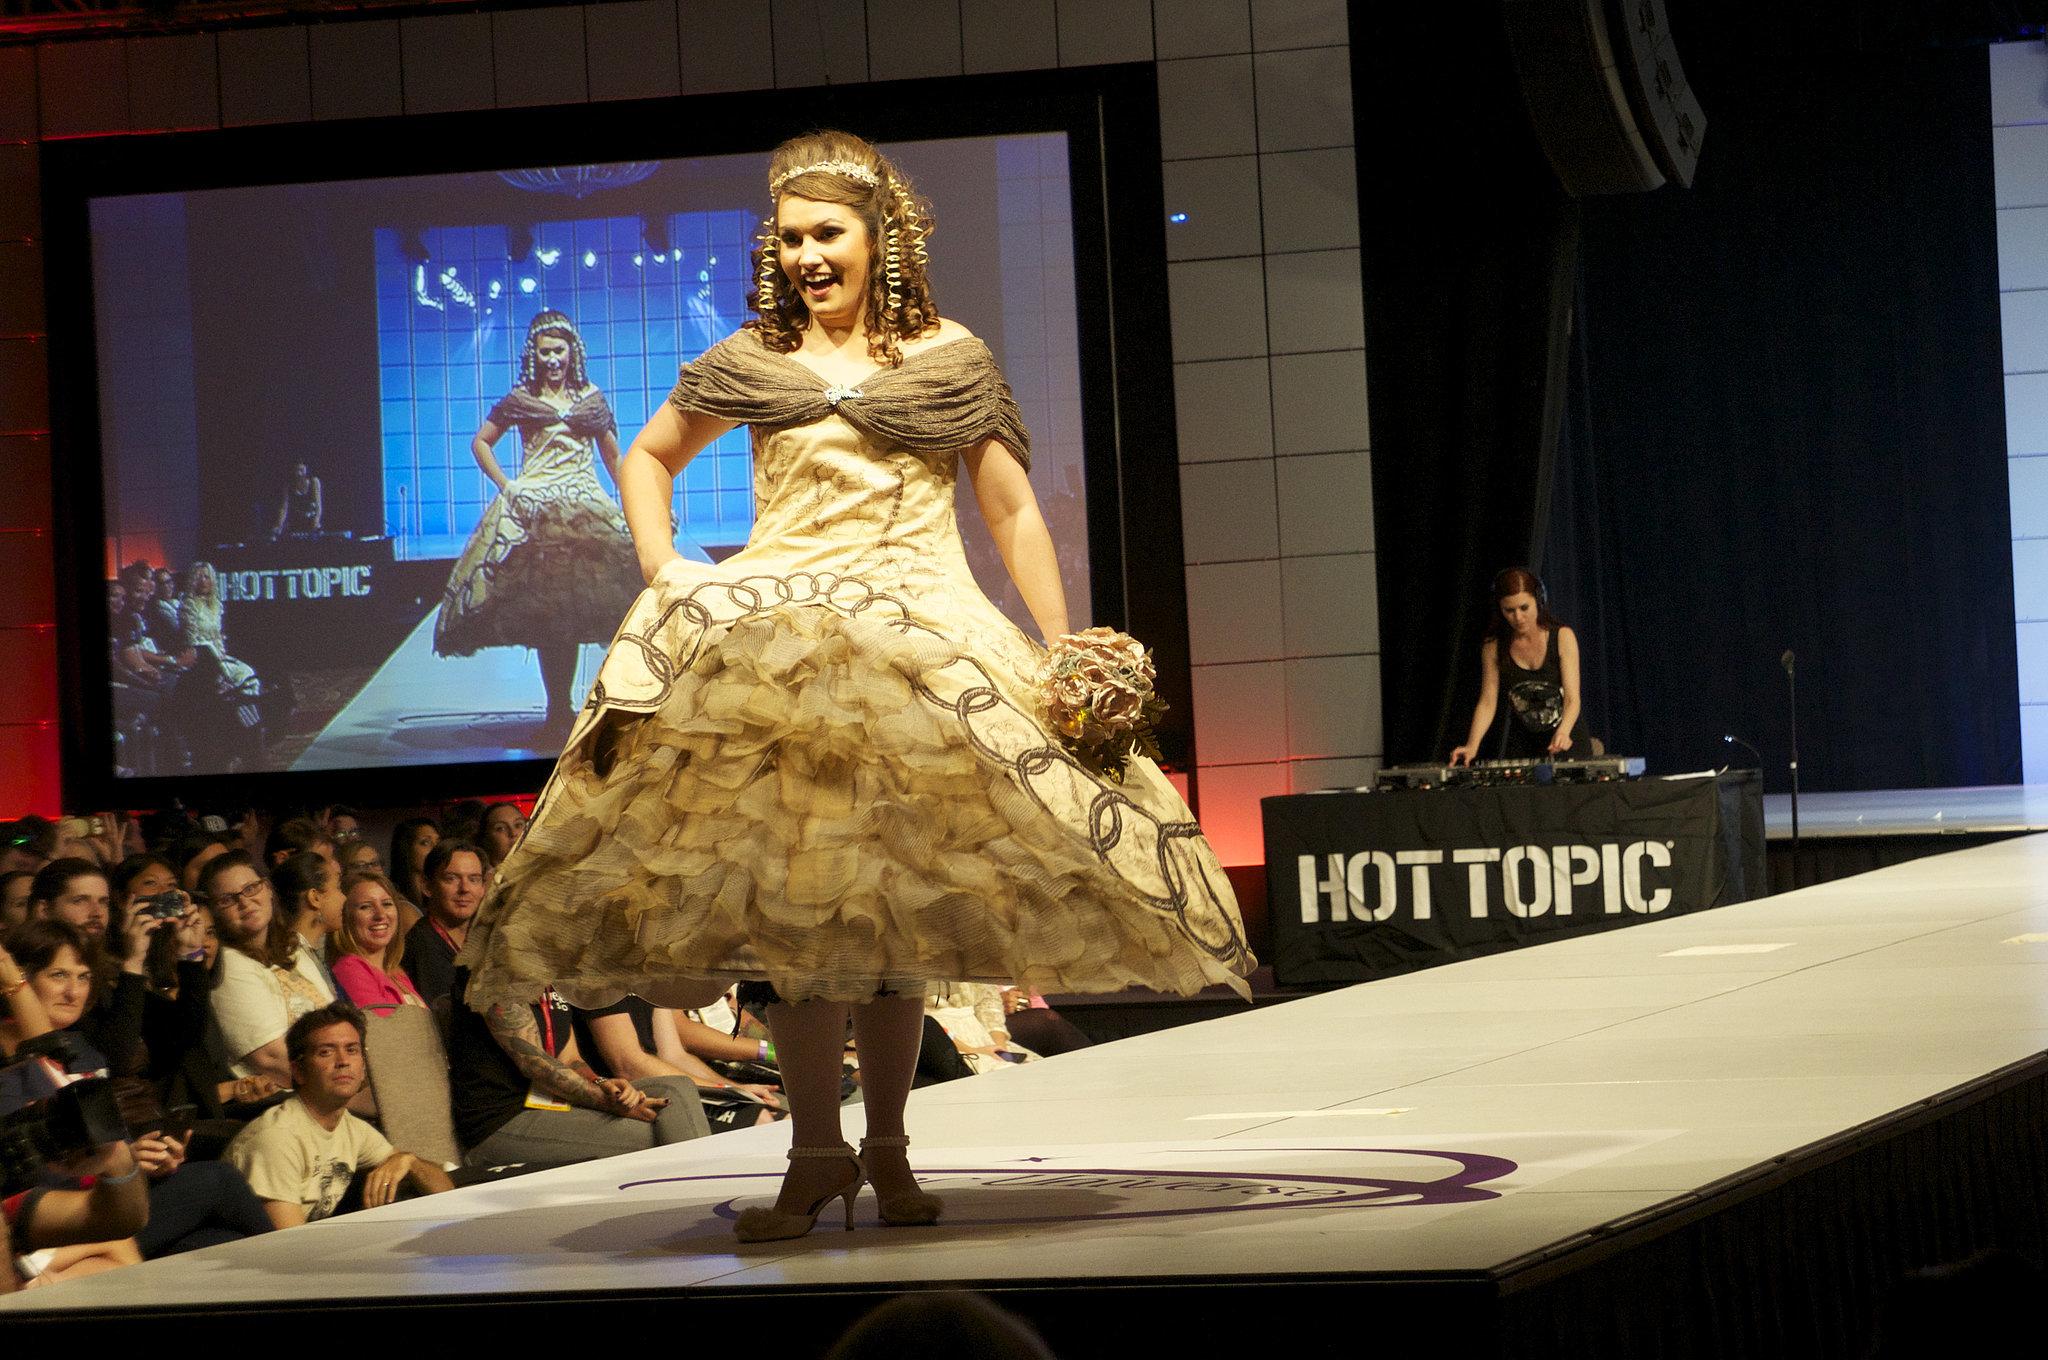 16. The Hobbit Wedding Dress